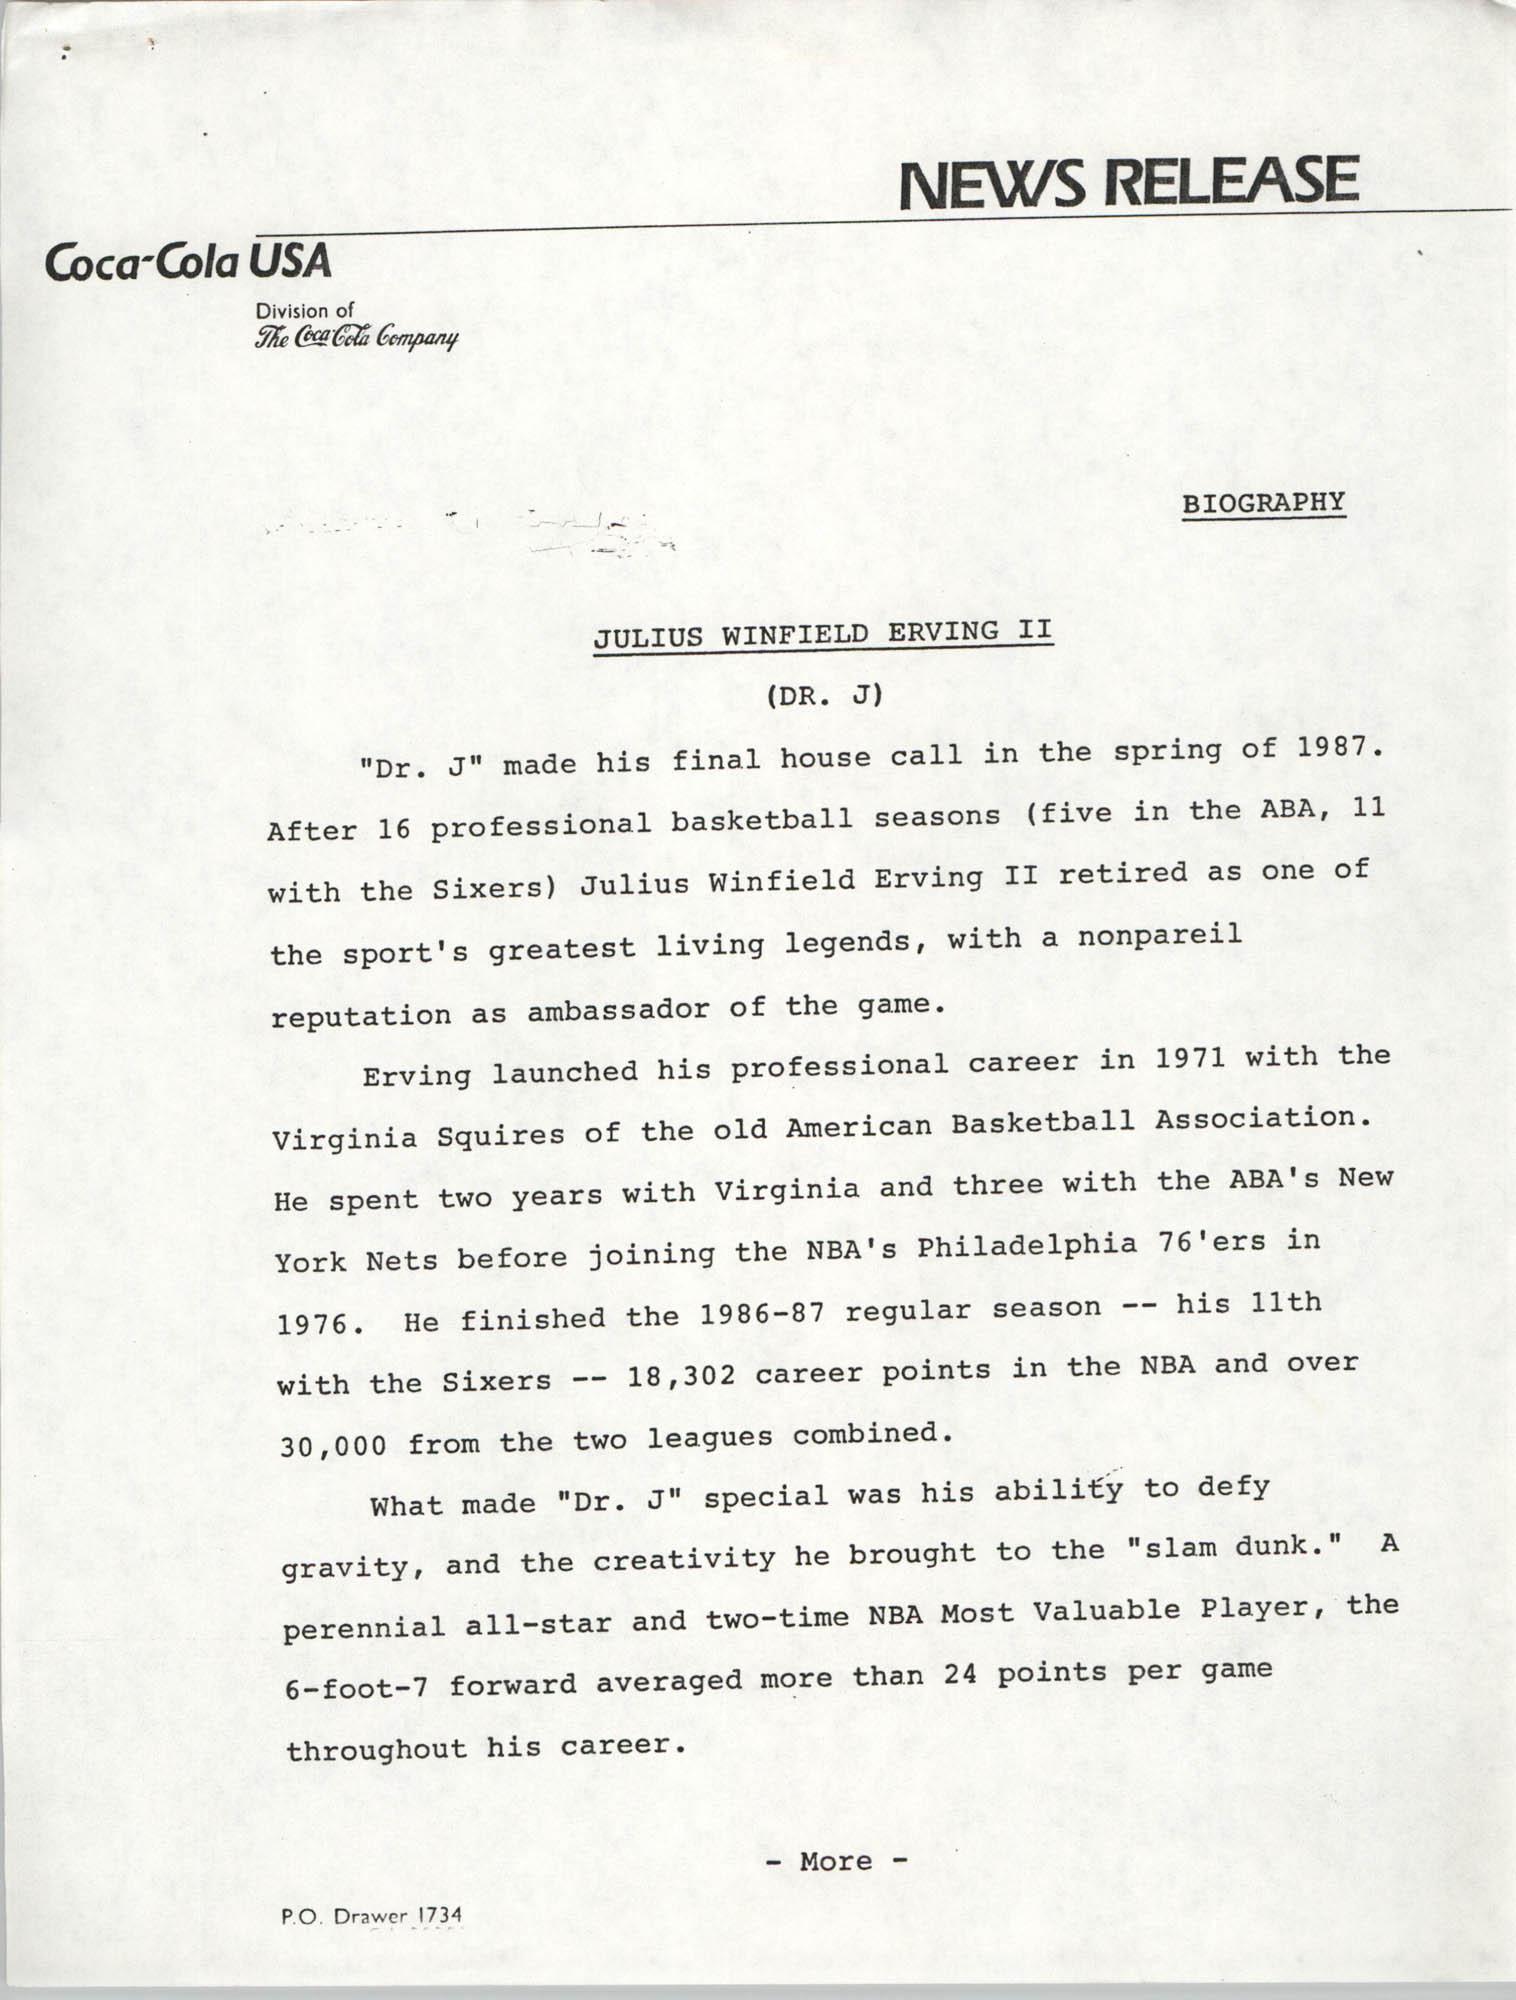 News Release, Biography, Julius Winfield Erving, II, Coca-Cola Company